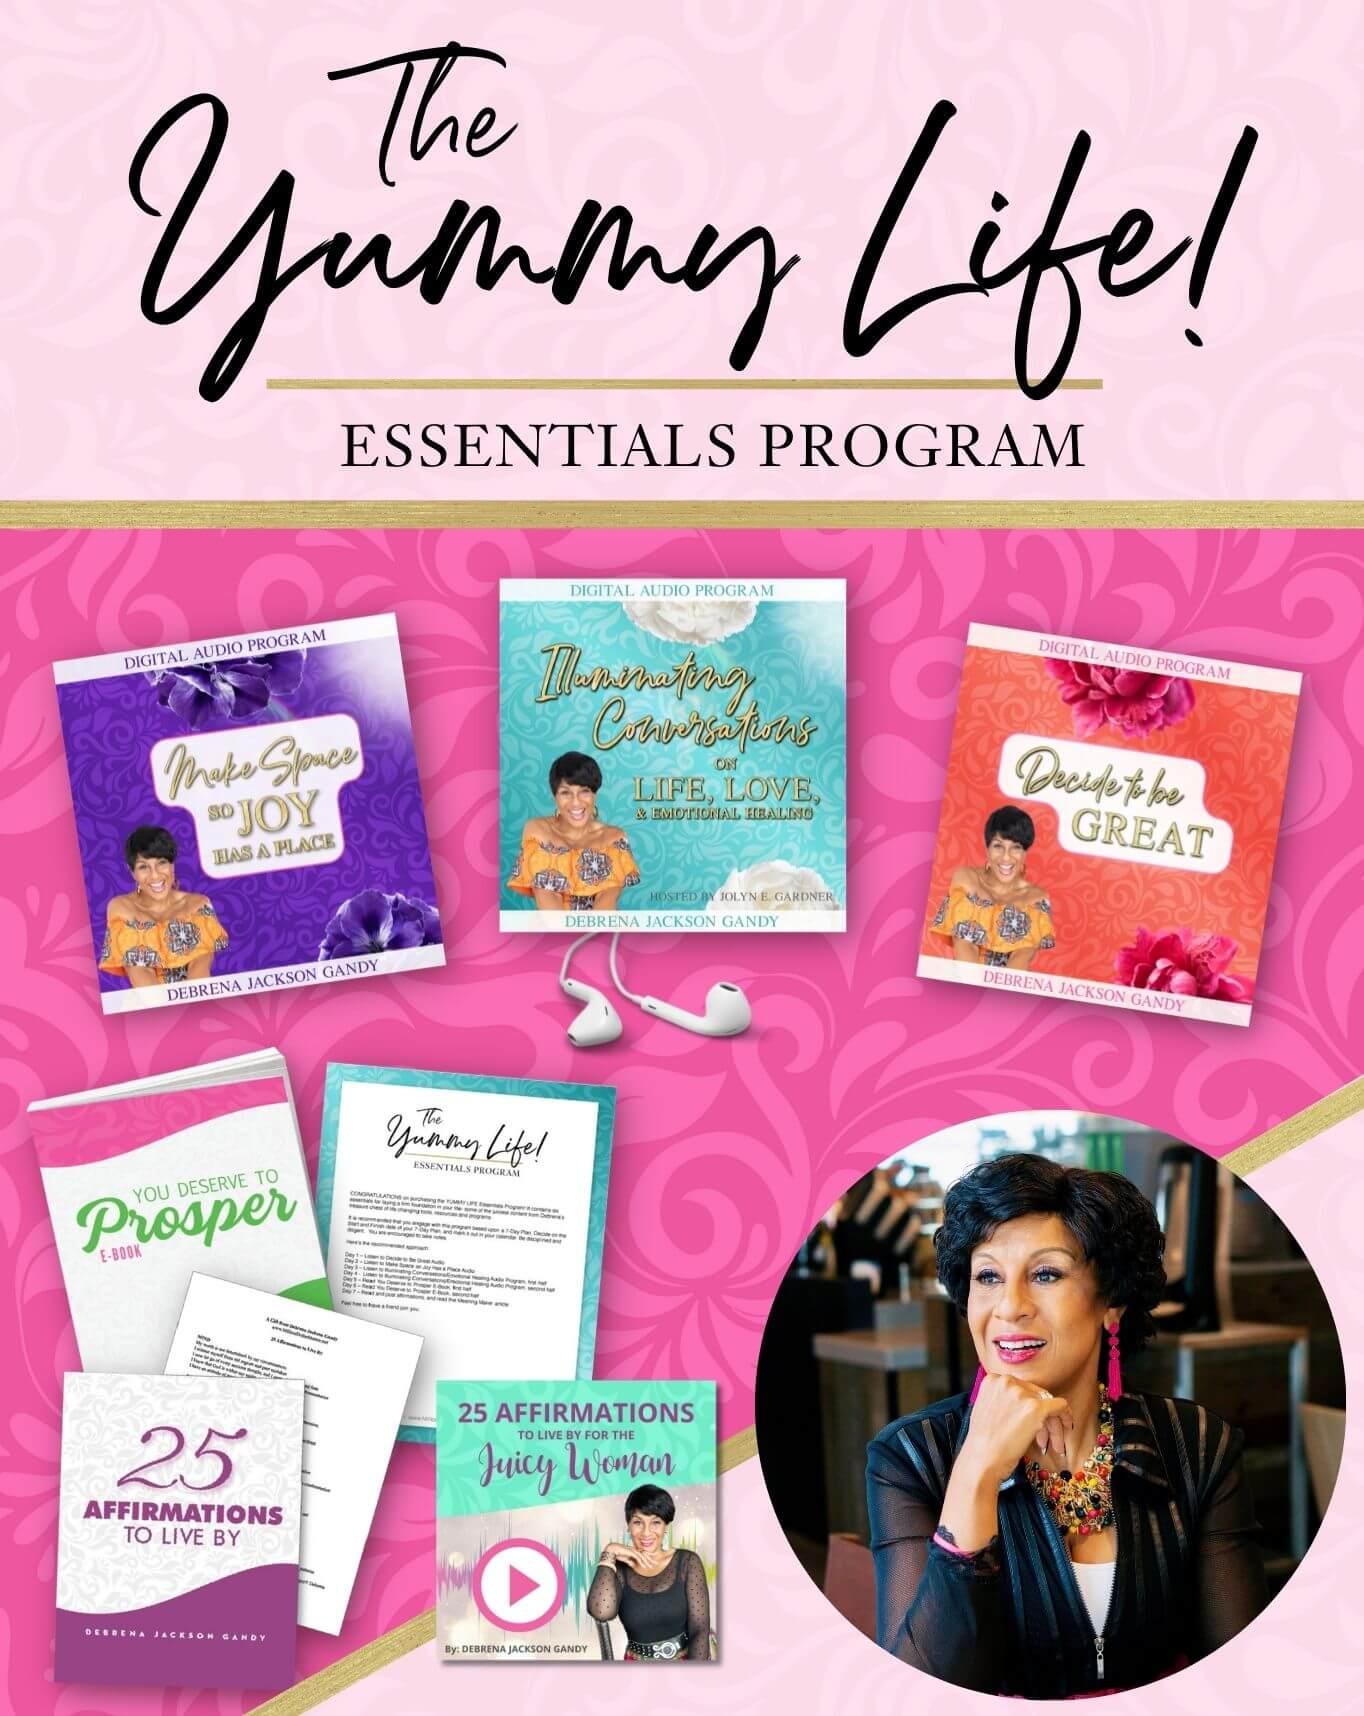 Debrena Jackson Gandy's The Yummy Life Essentials Program